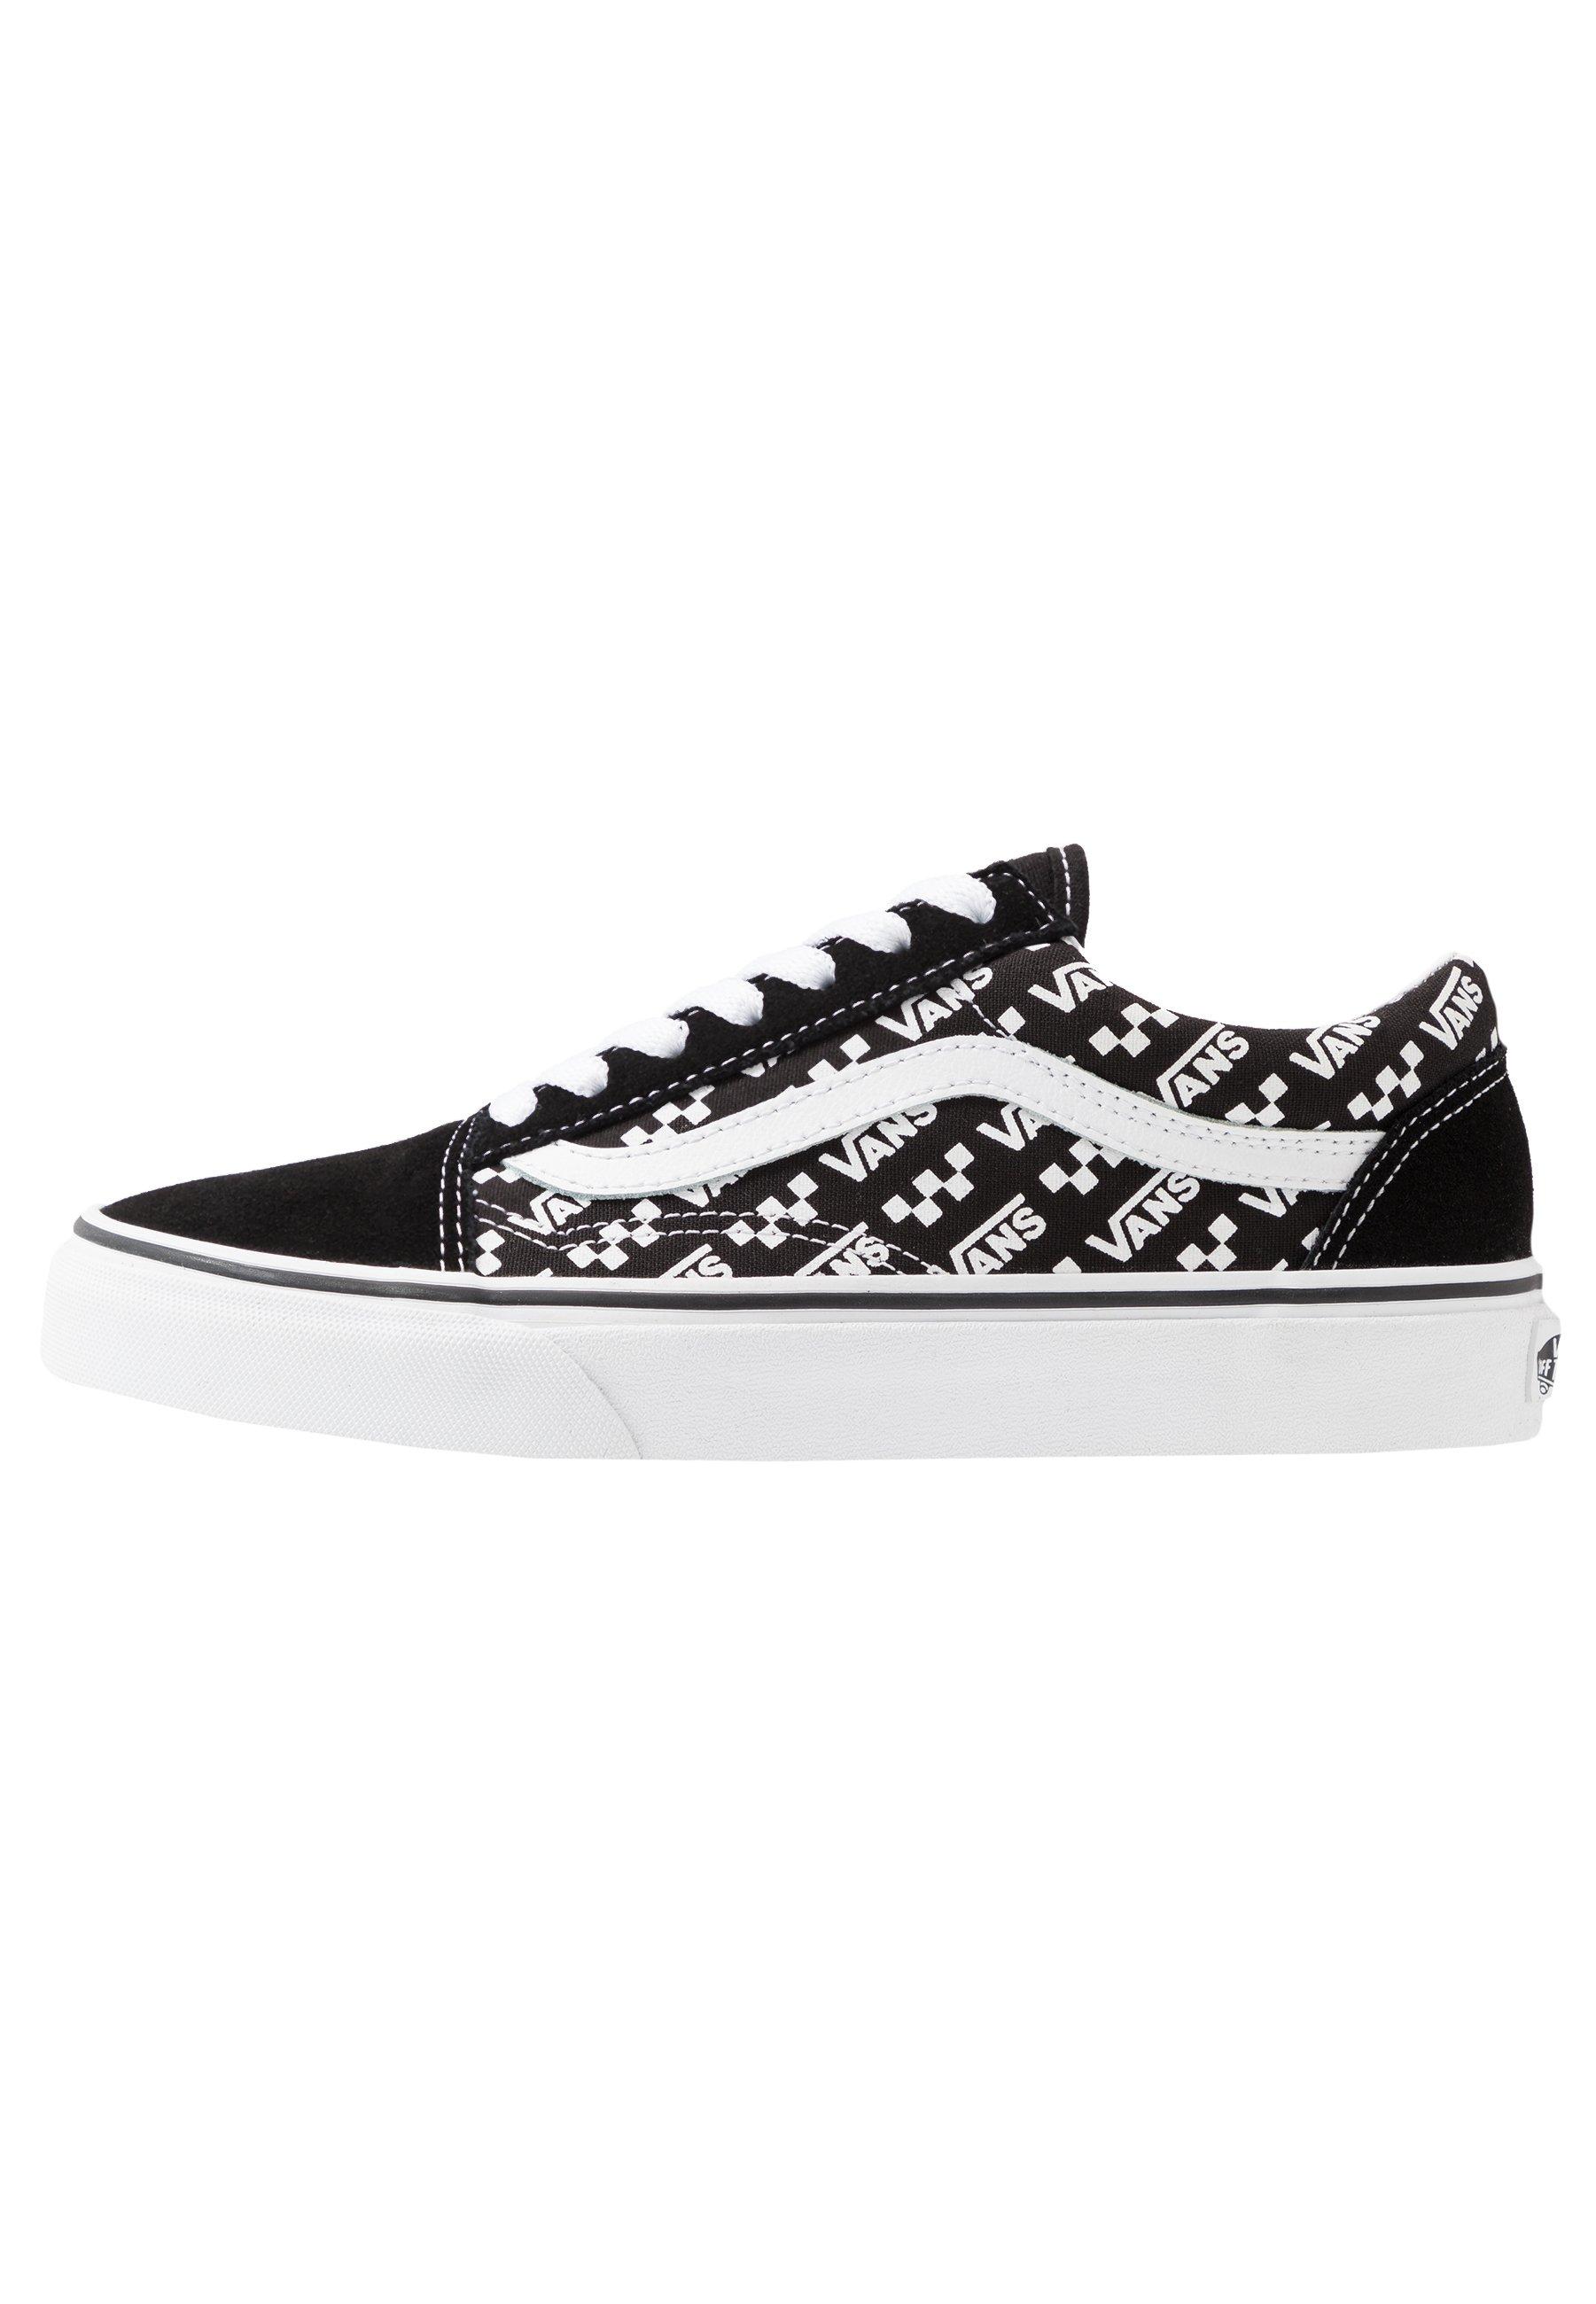 OLD SKOOL Chaussures de skate blacktrue white